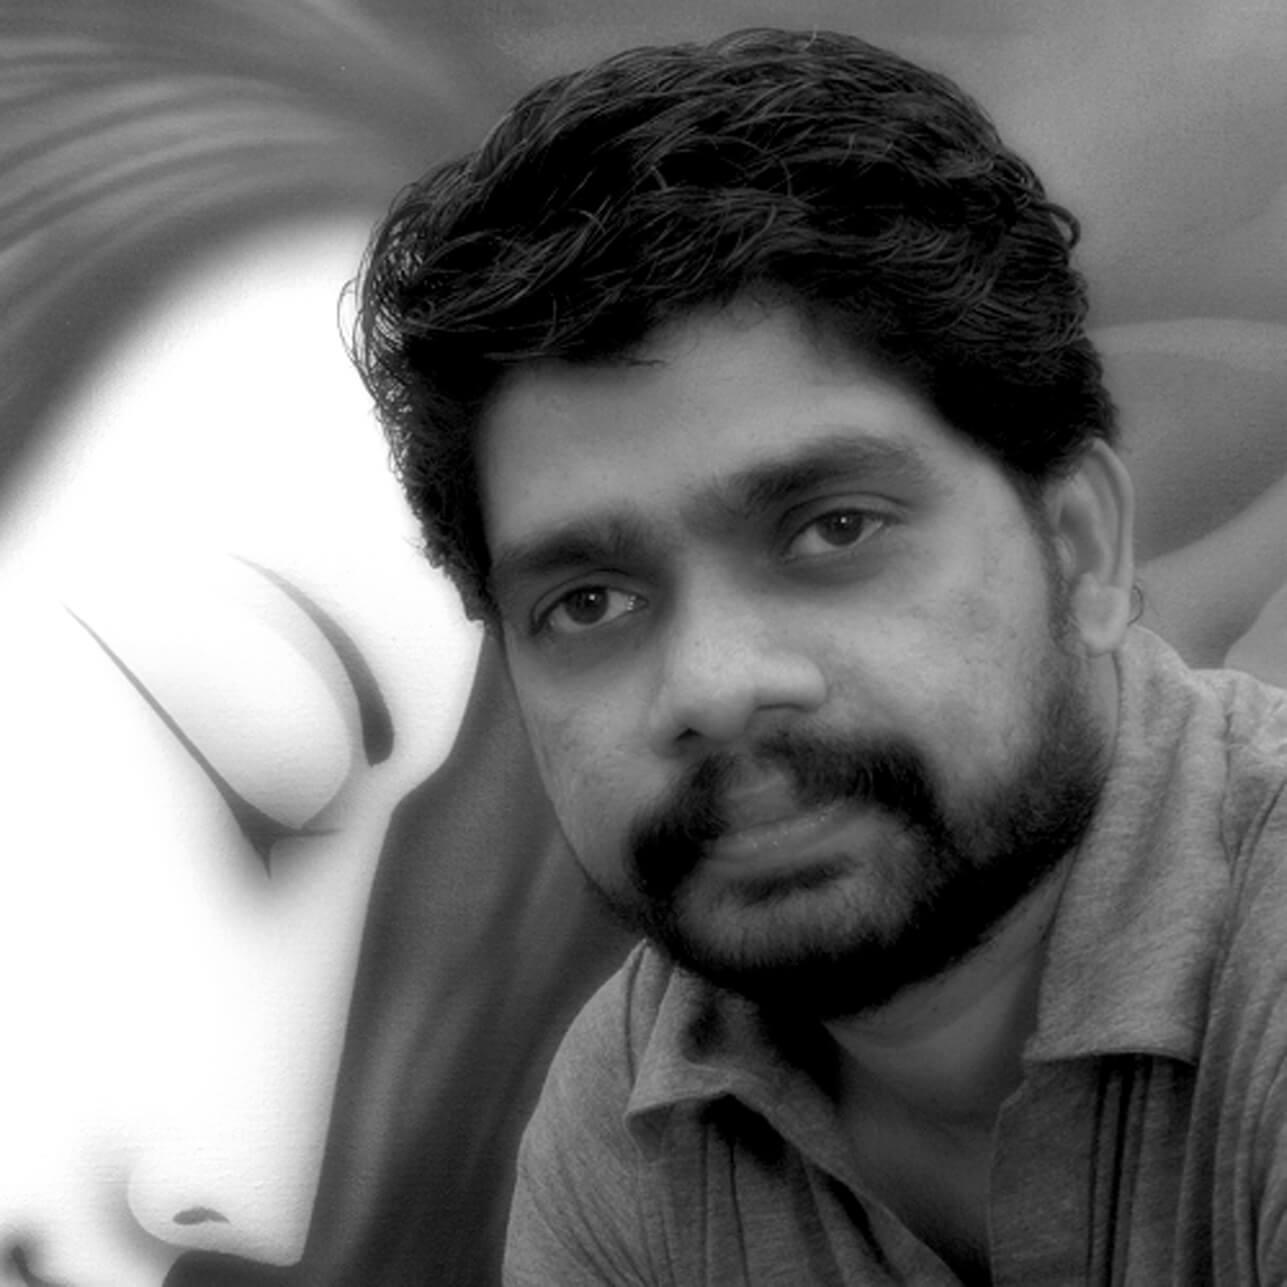 Pradeesh K. Rama